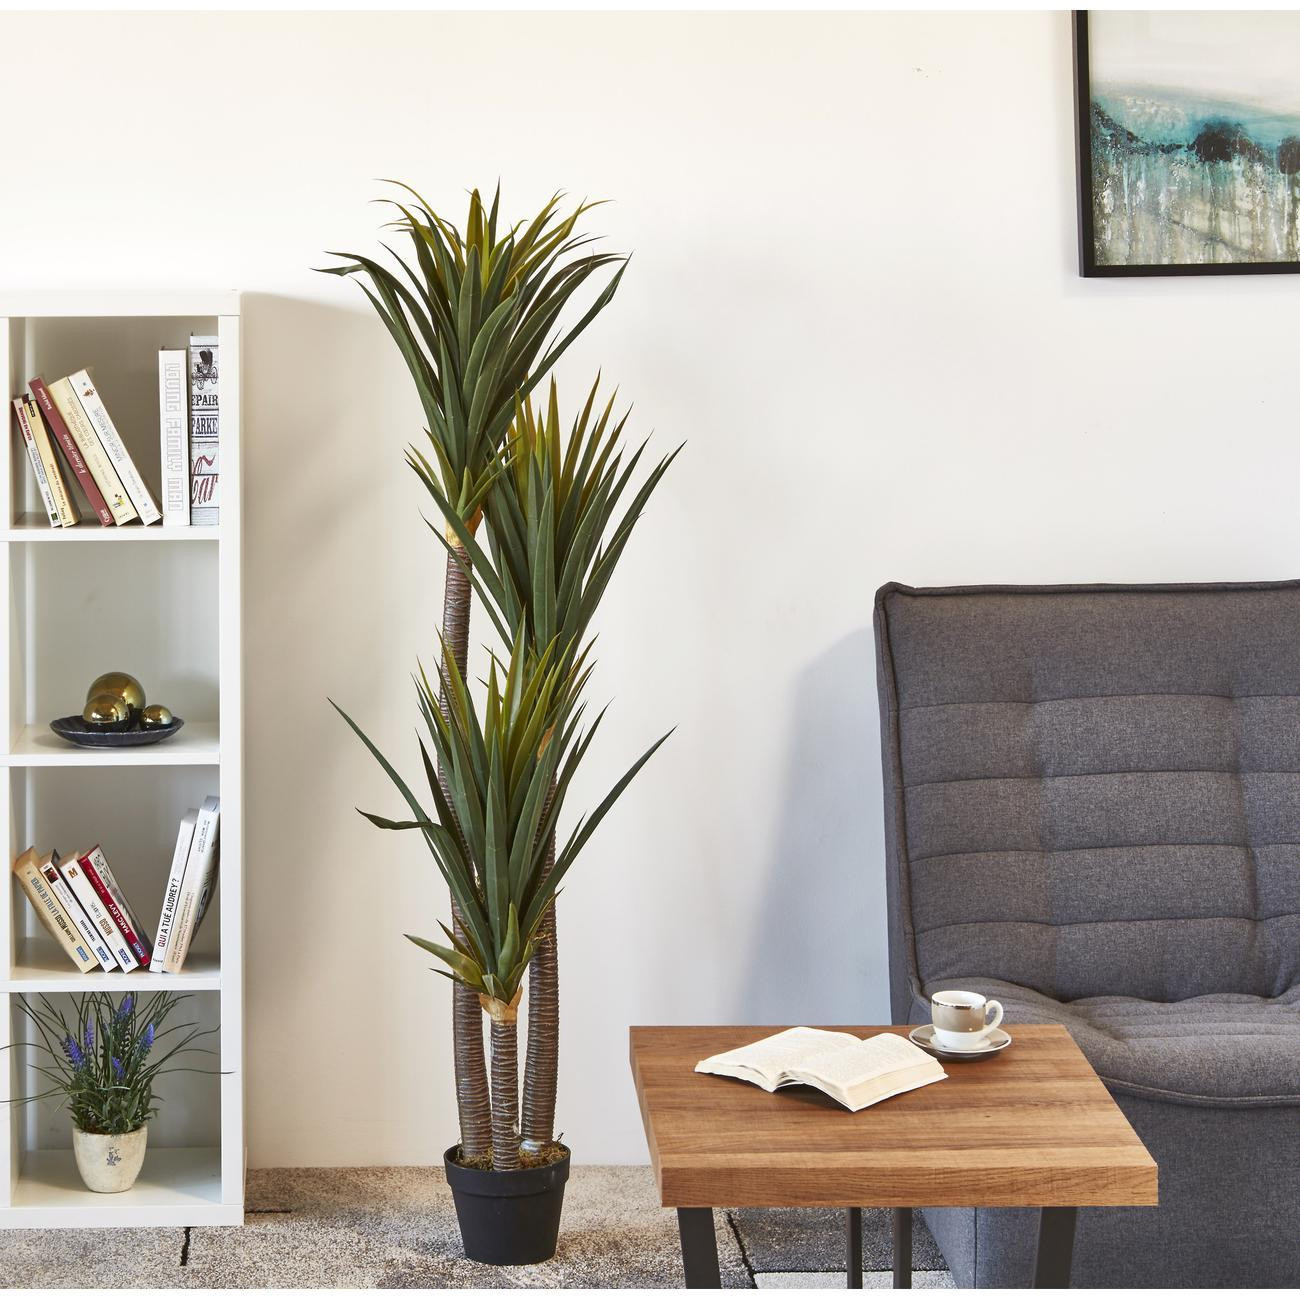 Plante artificielle OLLA 153 feuilles